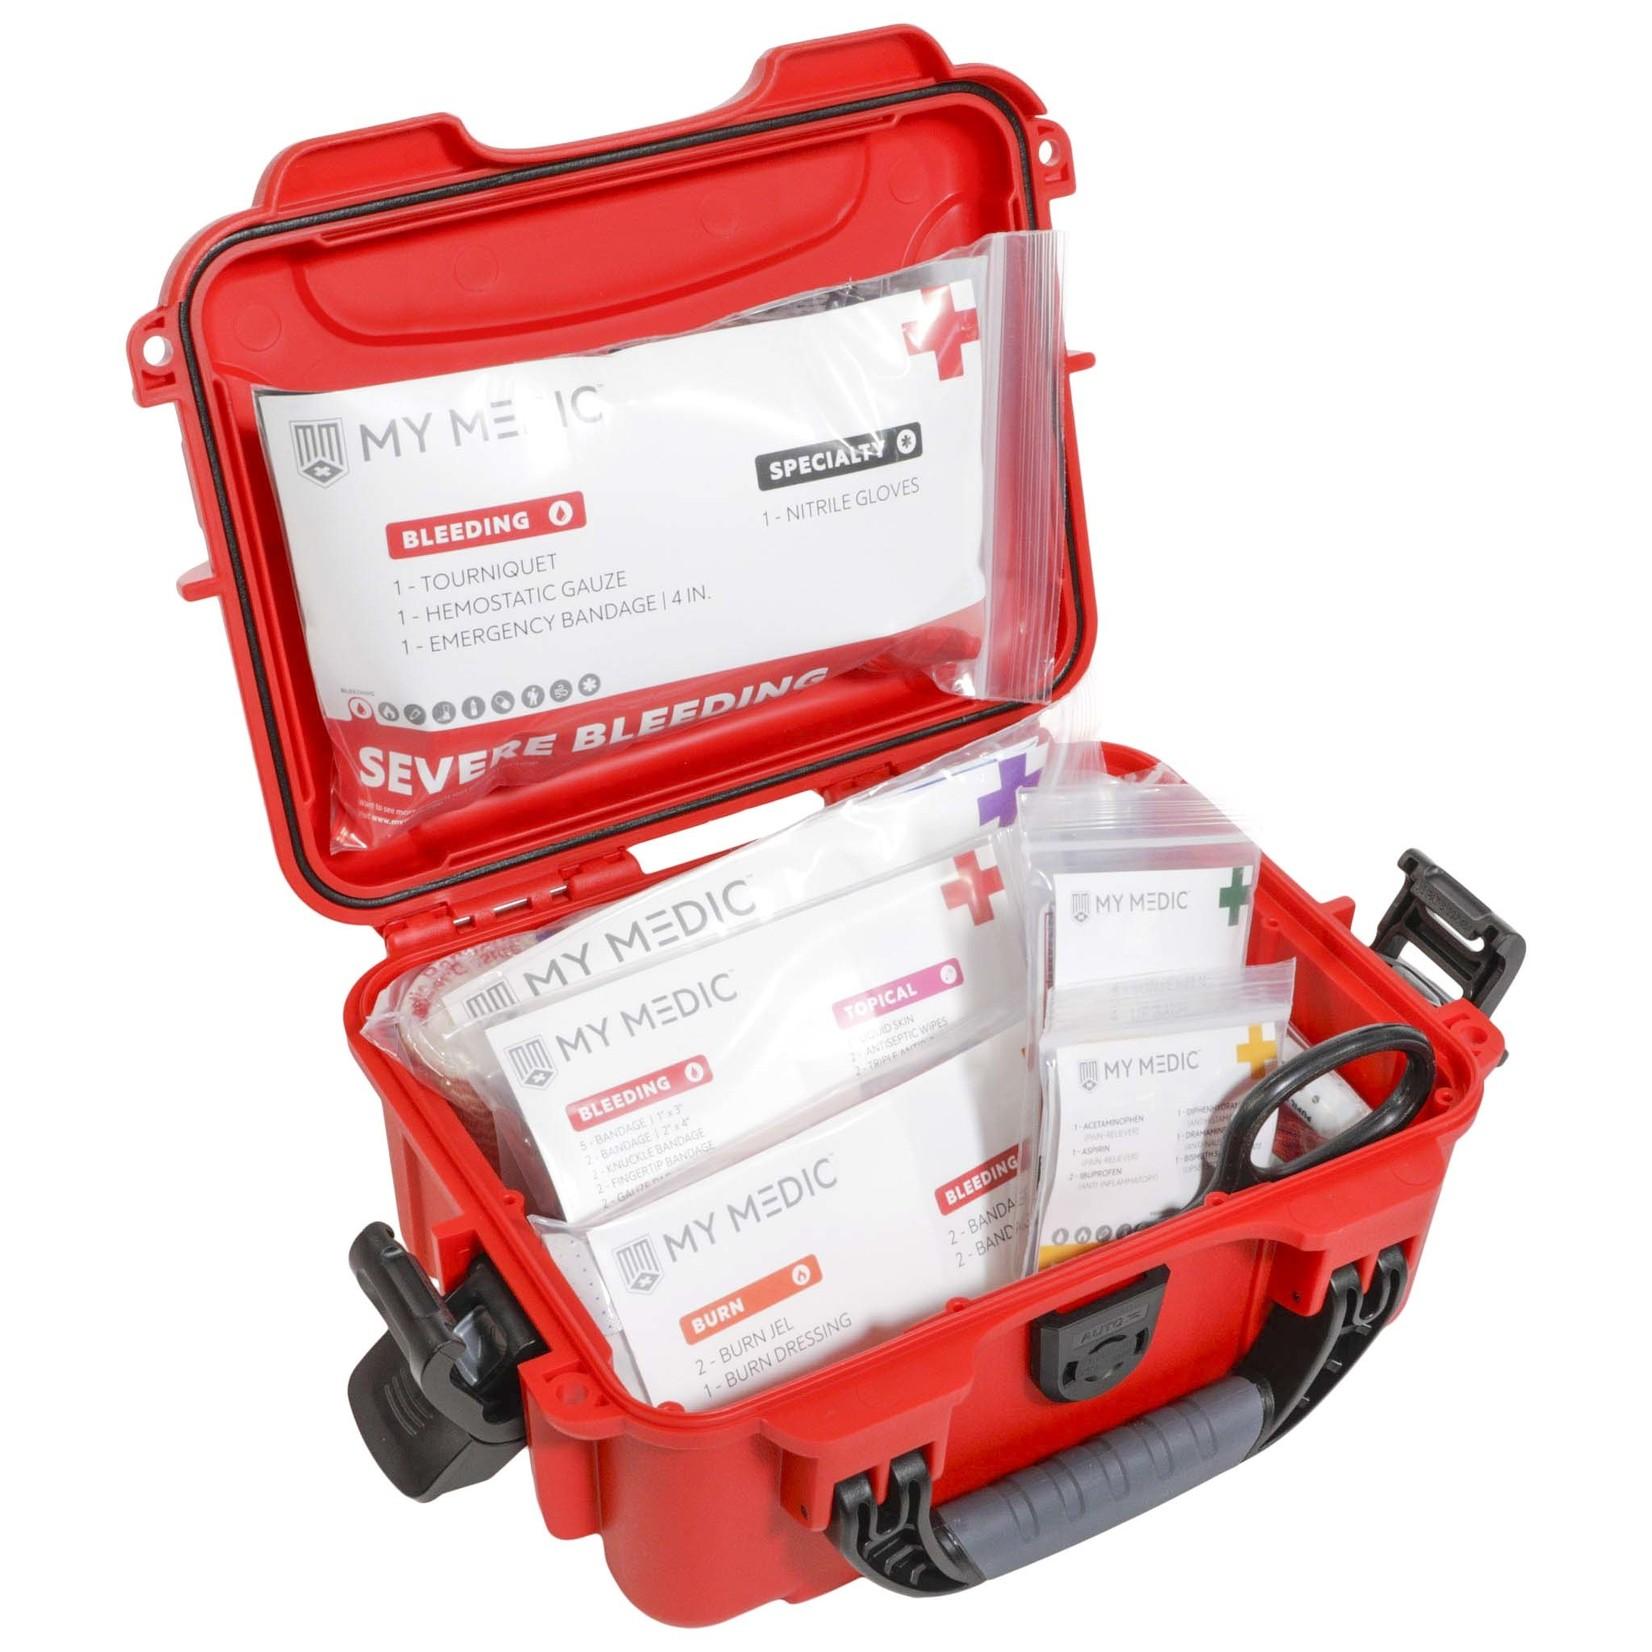 MyMedic Boat Medic First Aid Kit